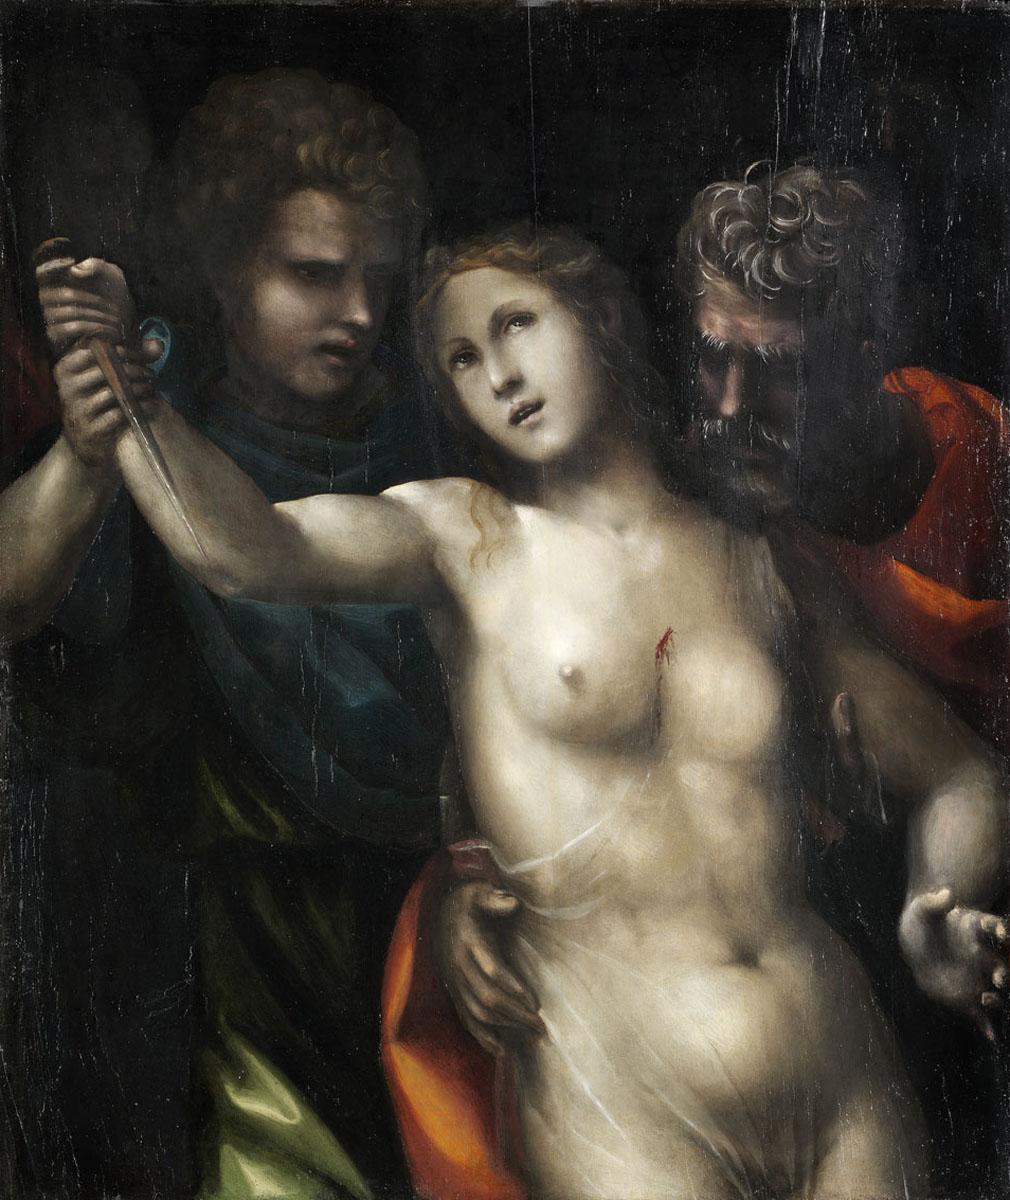 The Death of Lucretia by Il Sodoma